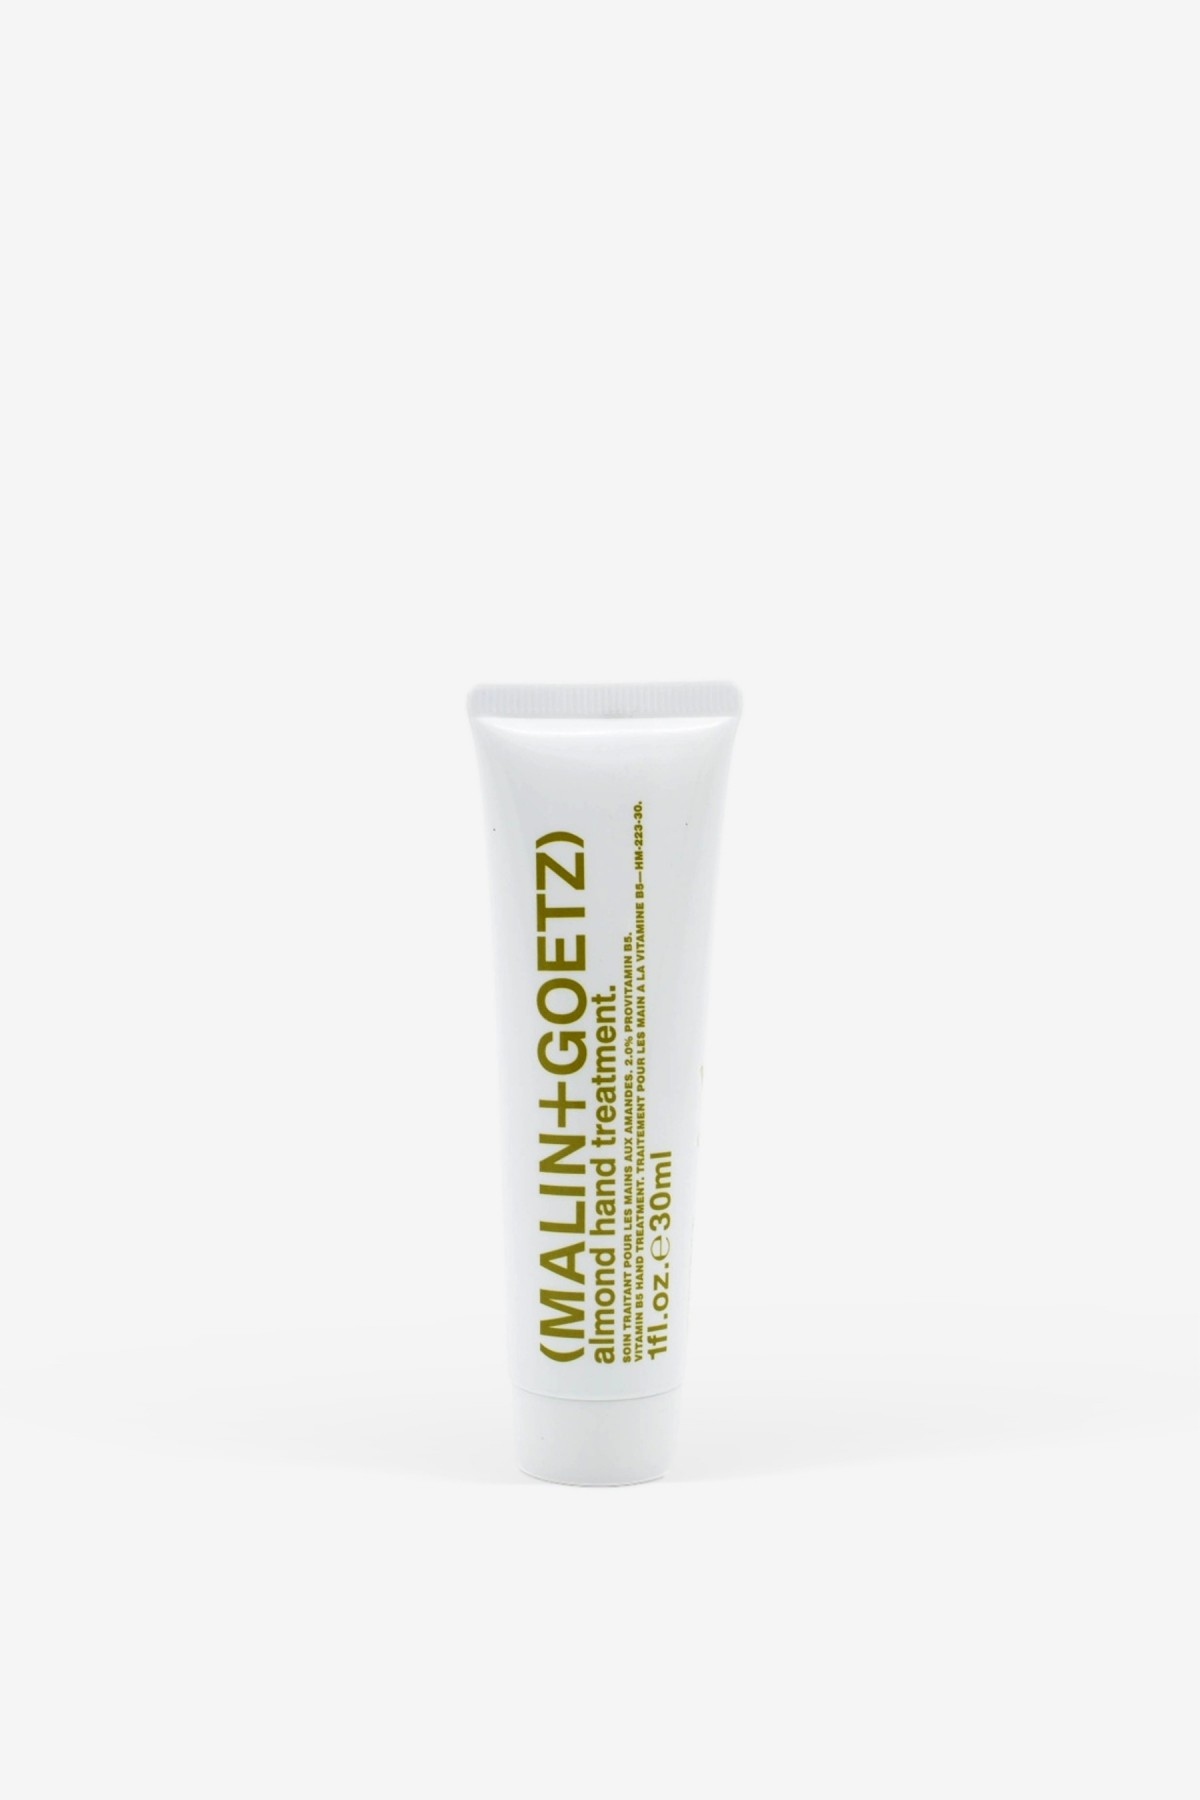 Malin+Goetz Almond Hand Treatment 30ml in